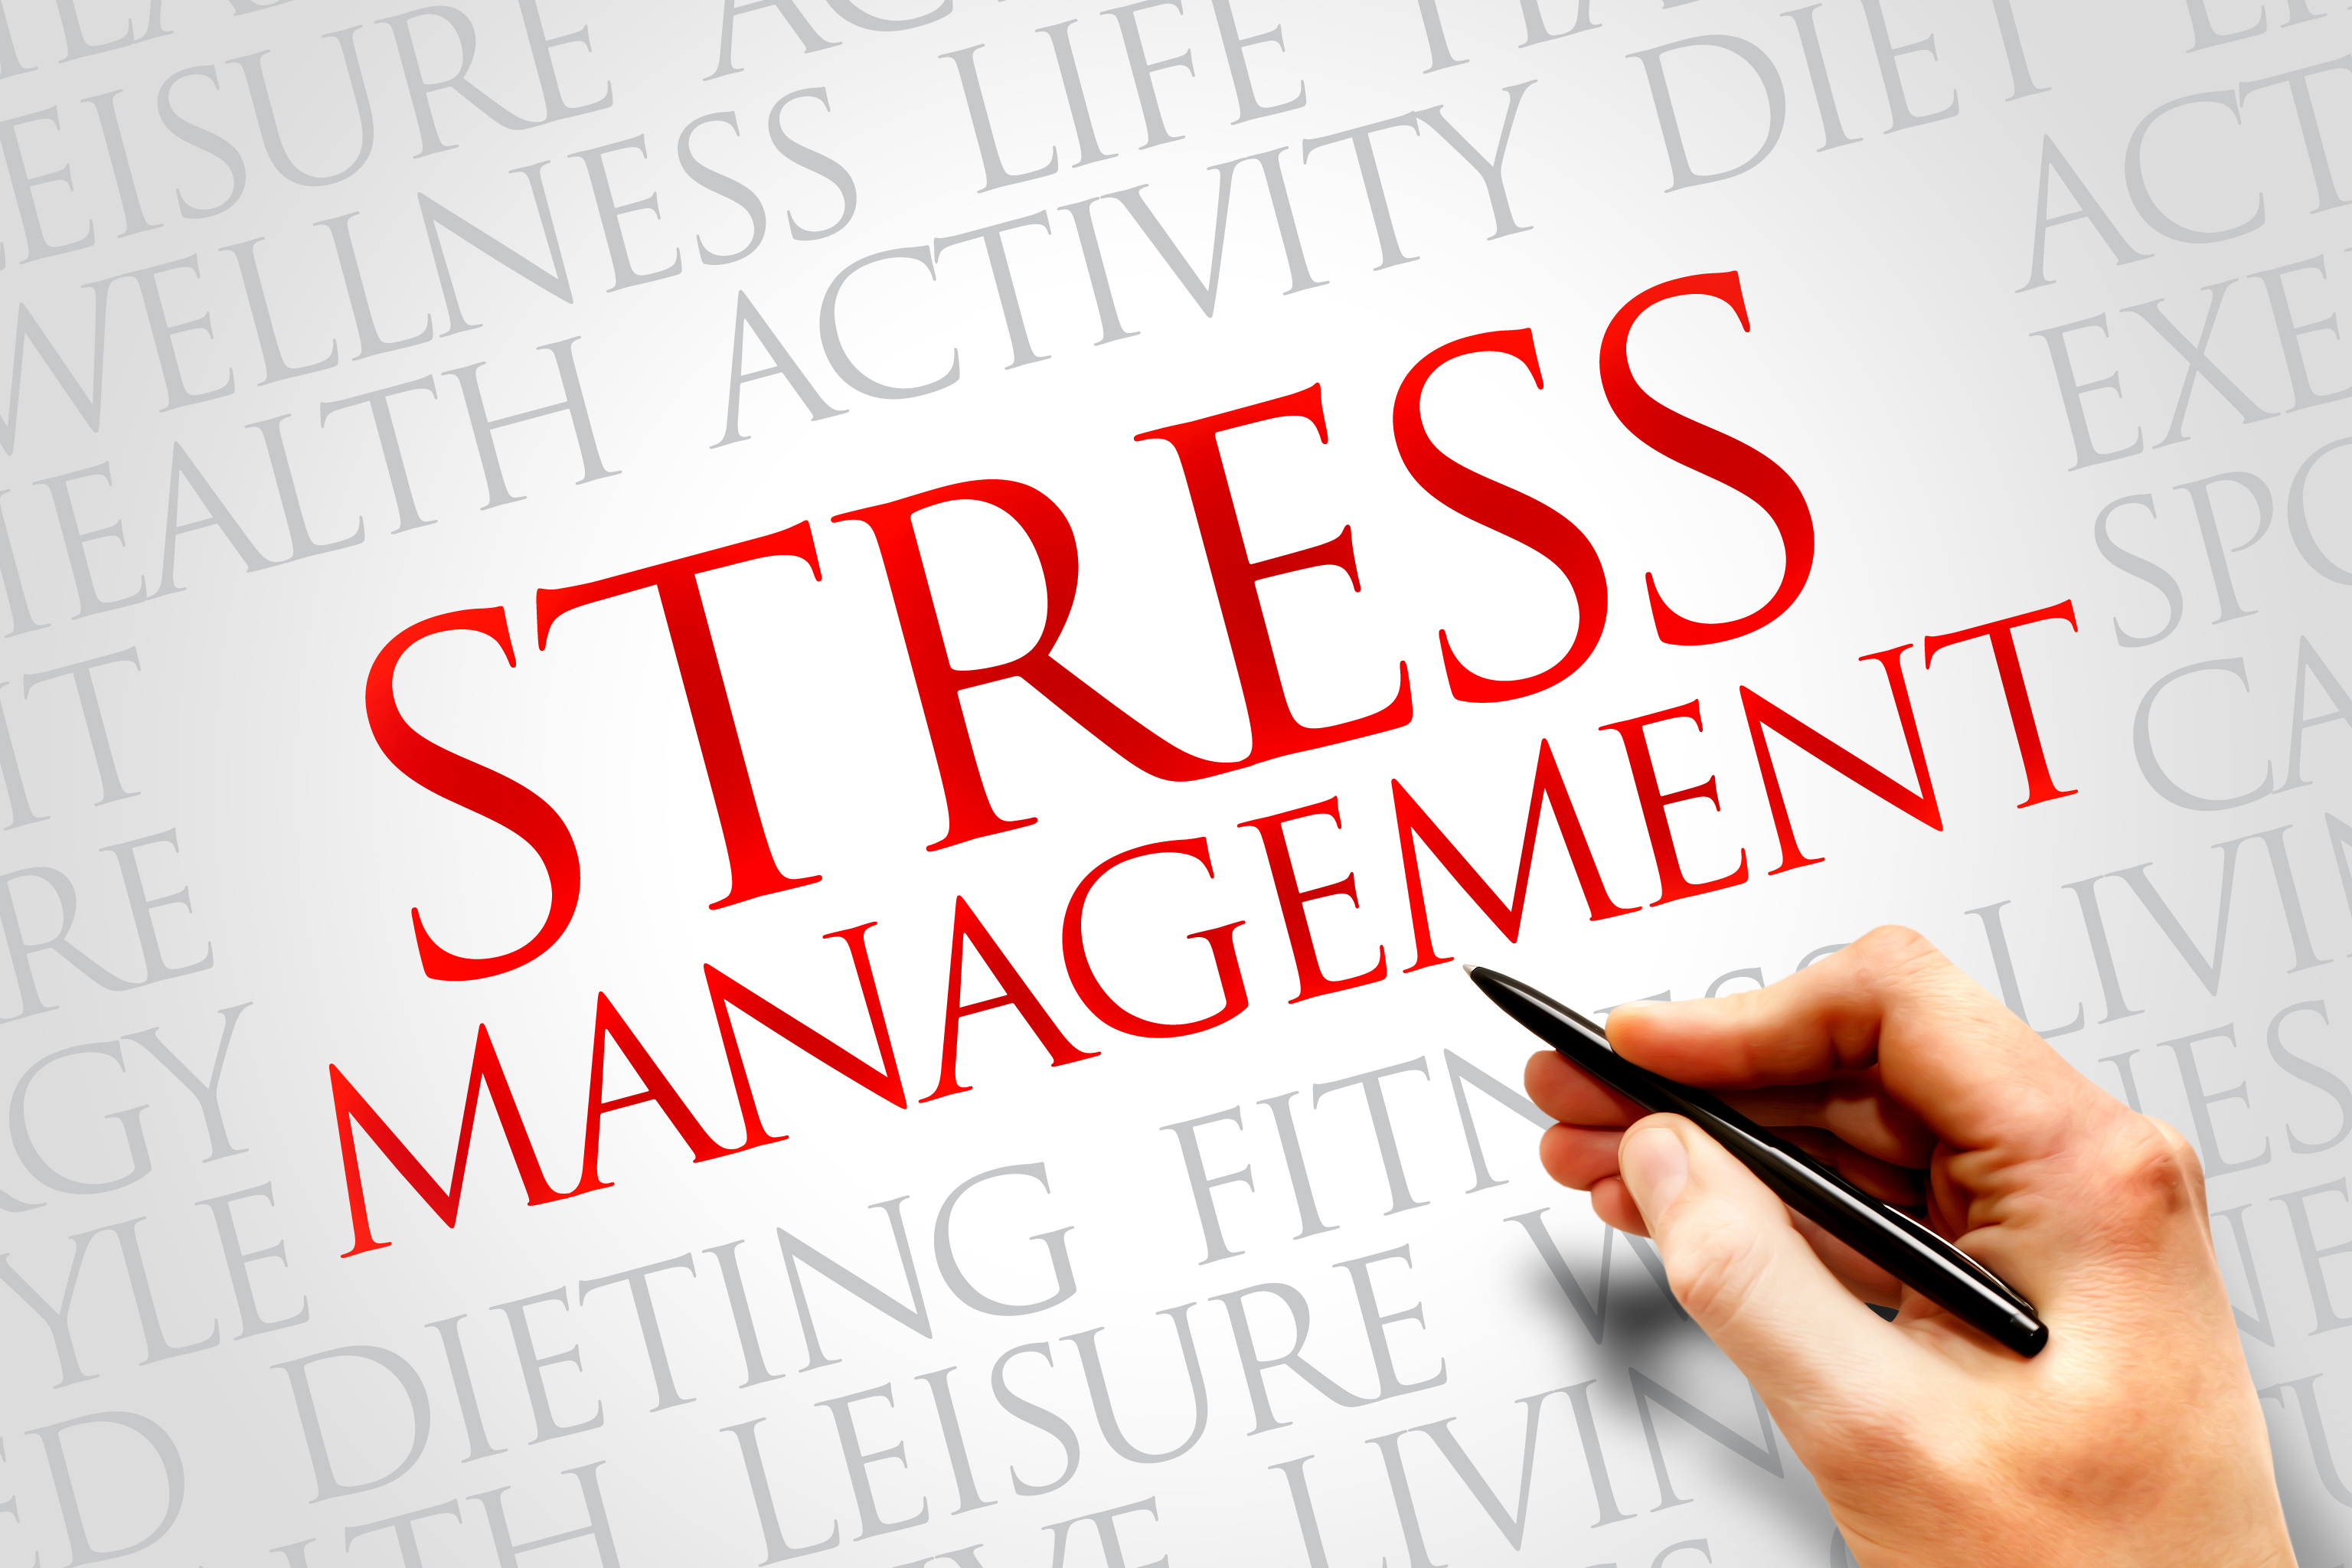 Essays about service stress